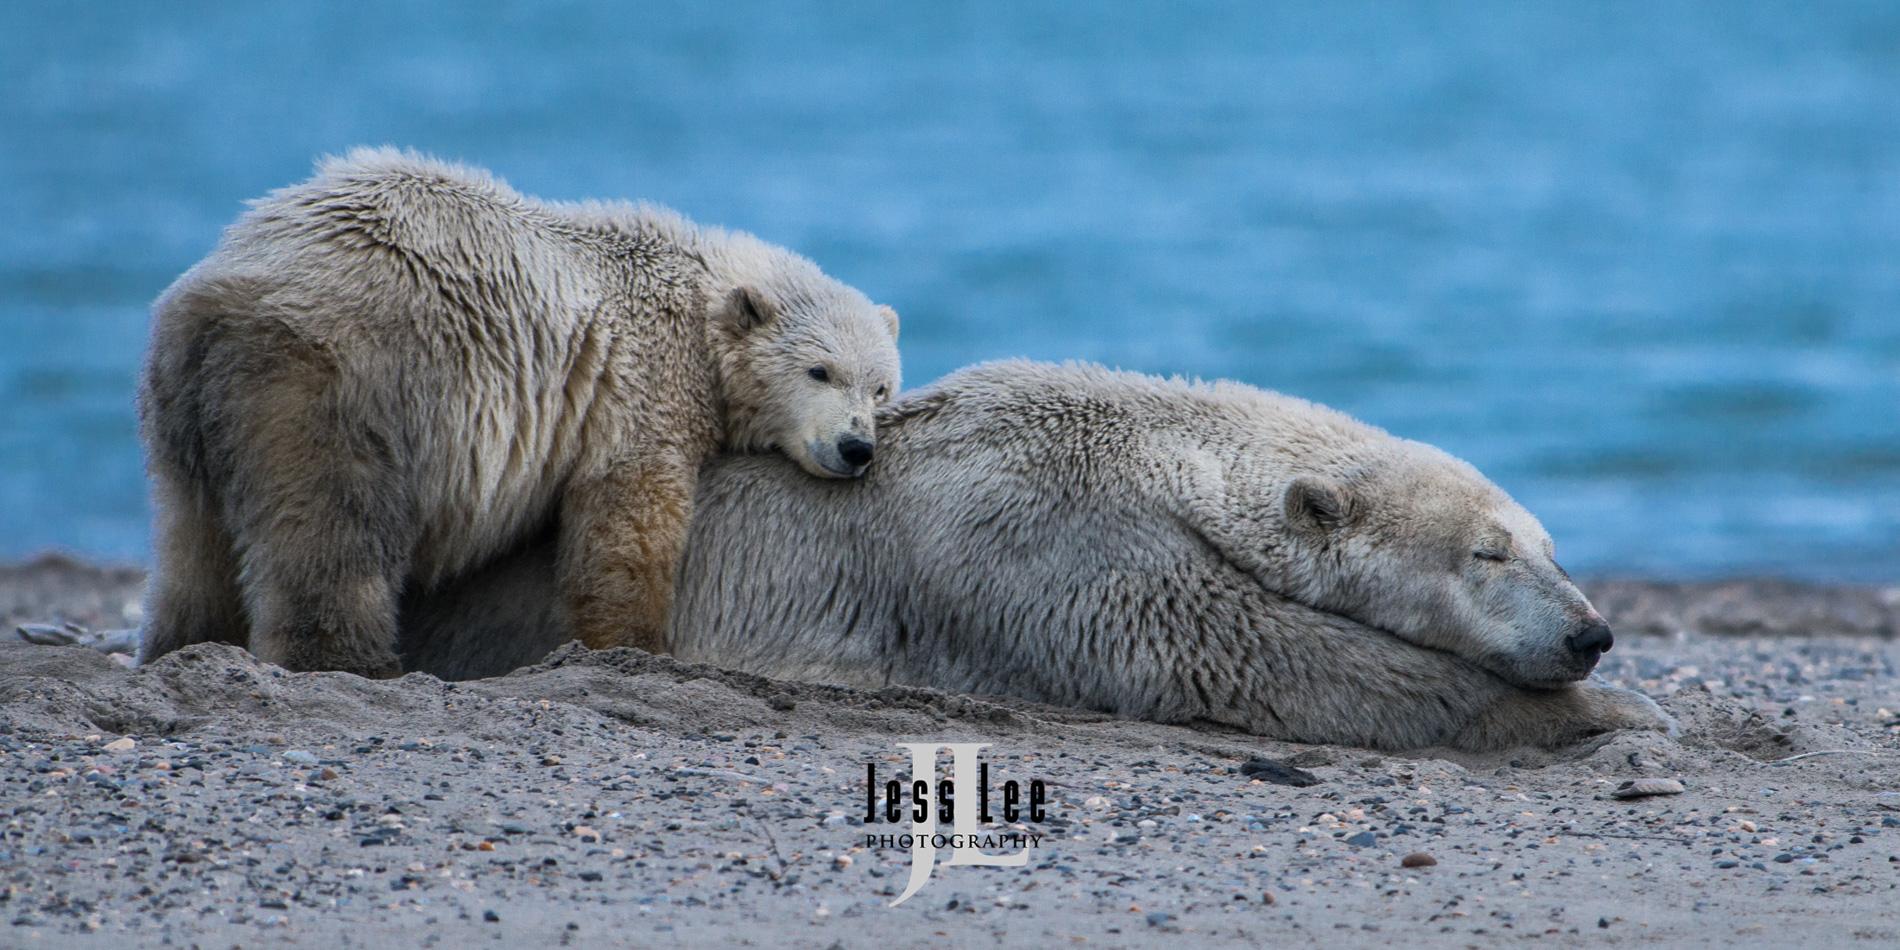 Polar bear in arctic, arctic National wildlife refuge, bear, bears, churchill, mammal, Alaska, marine, polar, polar bear, polar bears, ANWR,, photo